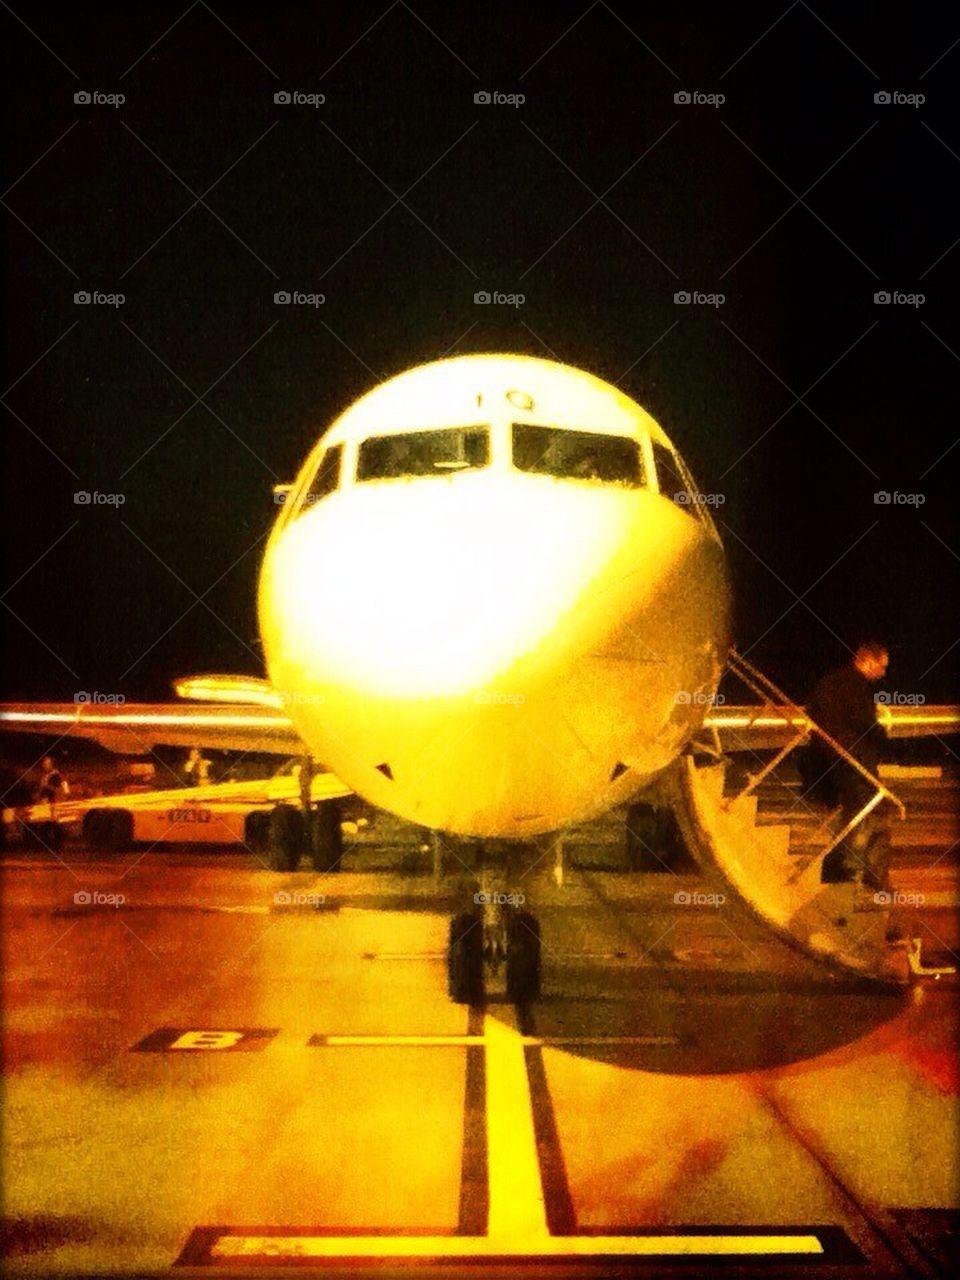 download leaving on a jet plane lyrics